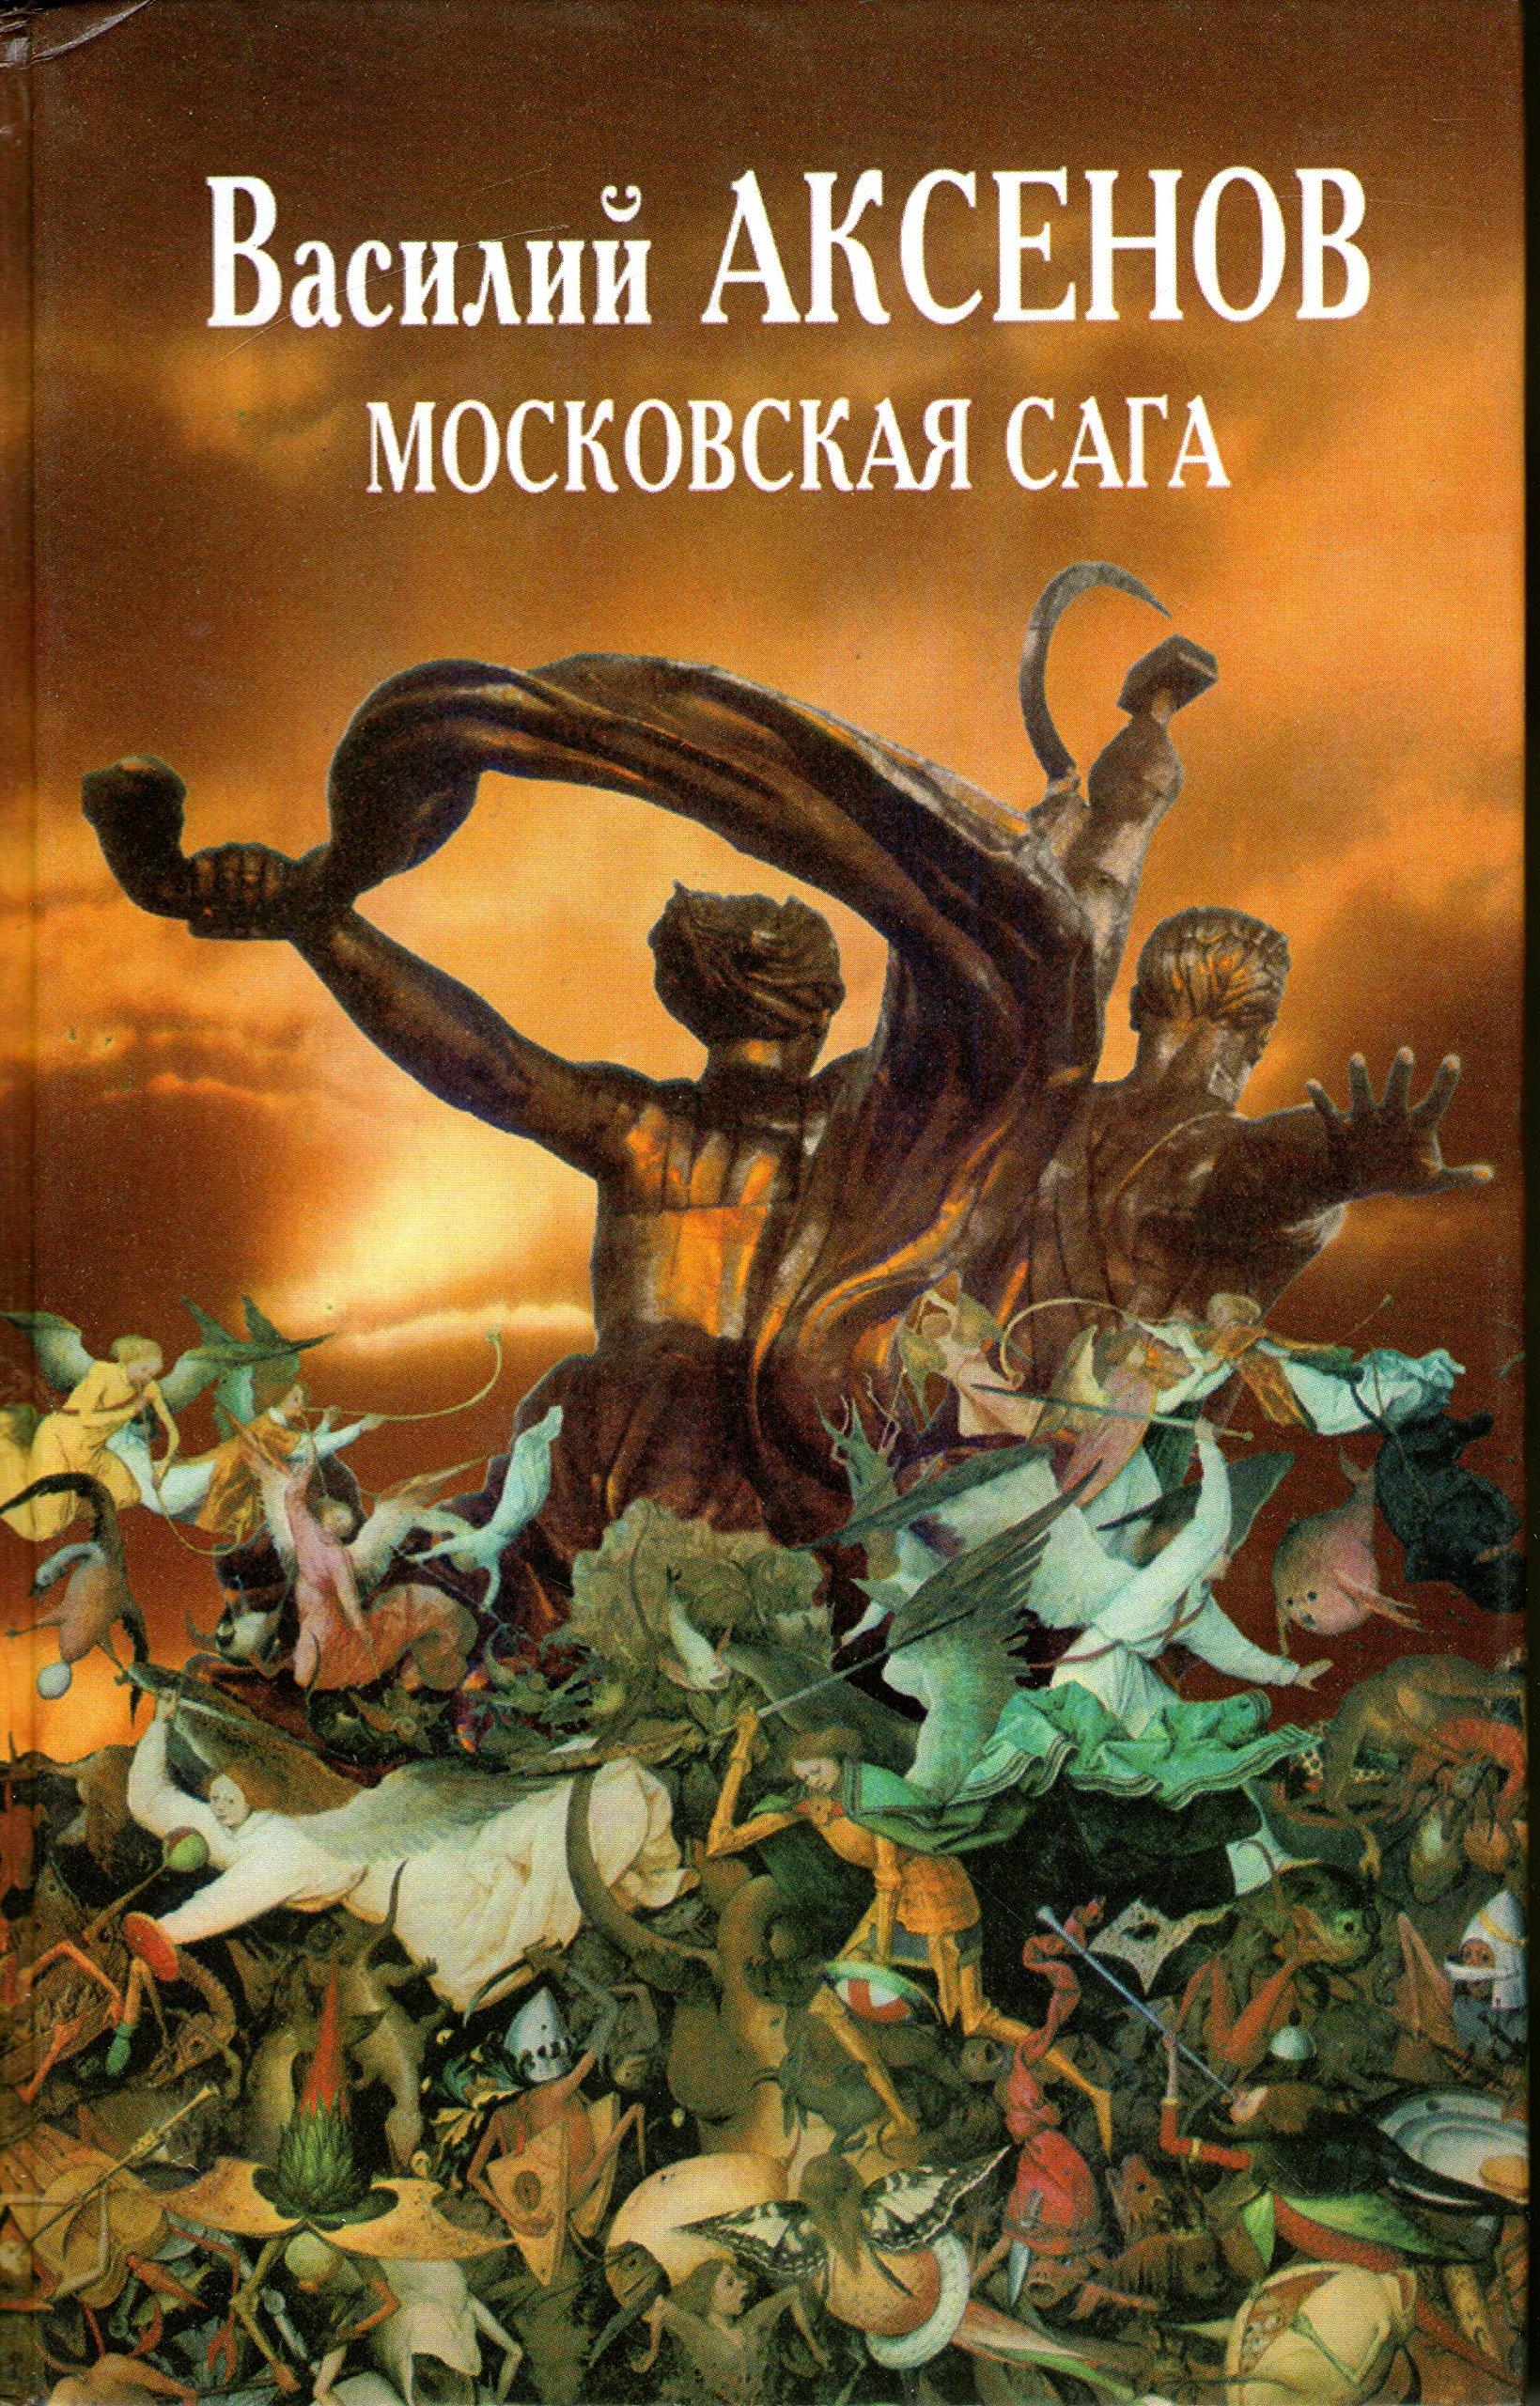 Moskovisea Saga